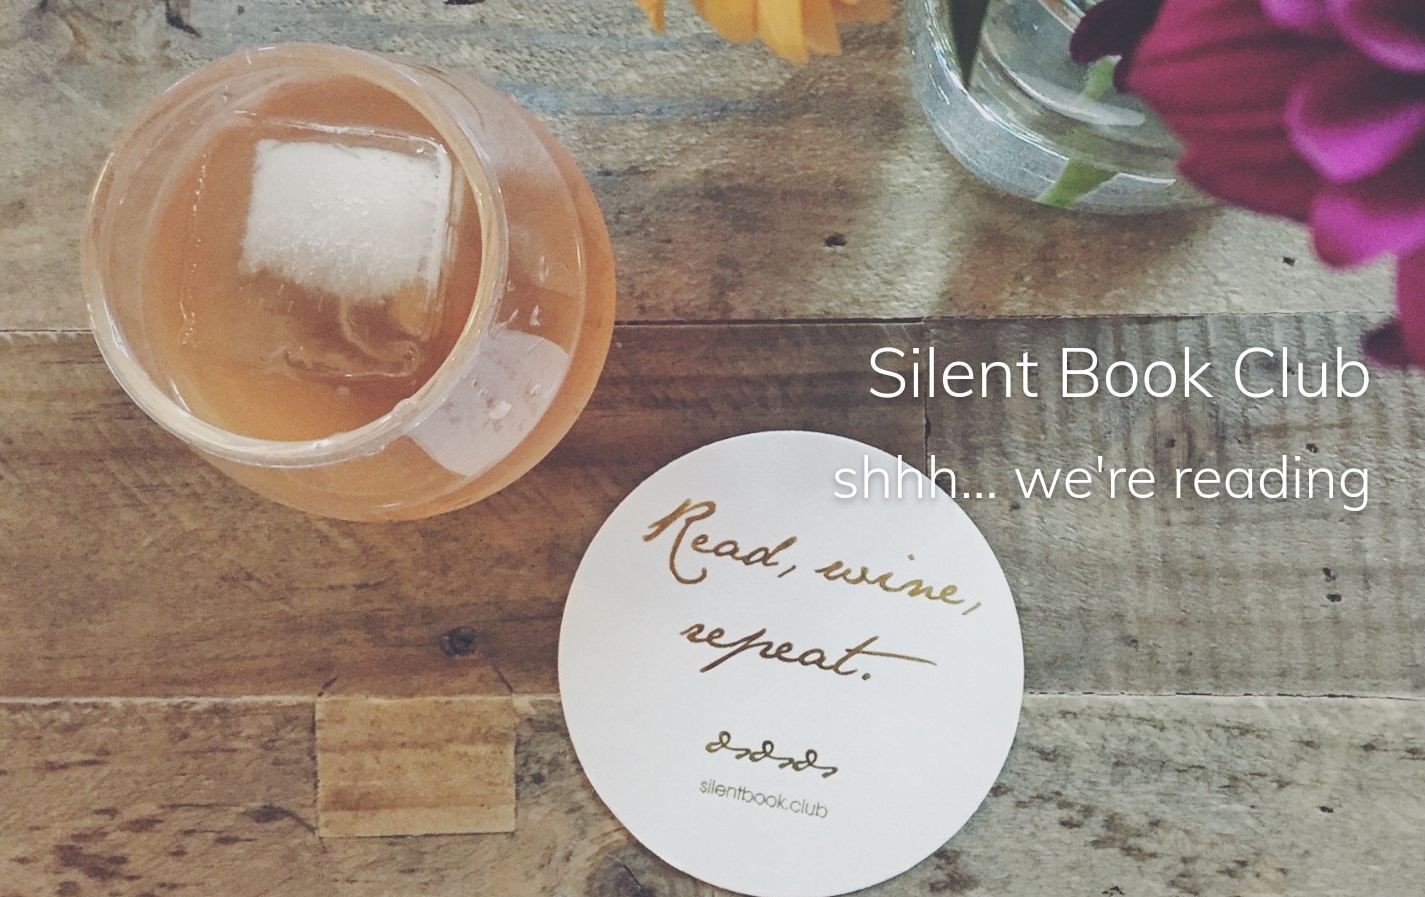 Silent Book Club - Sacramento Chapter